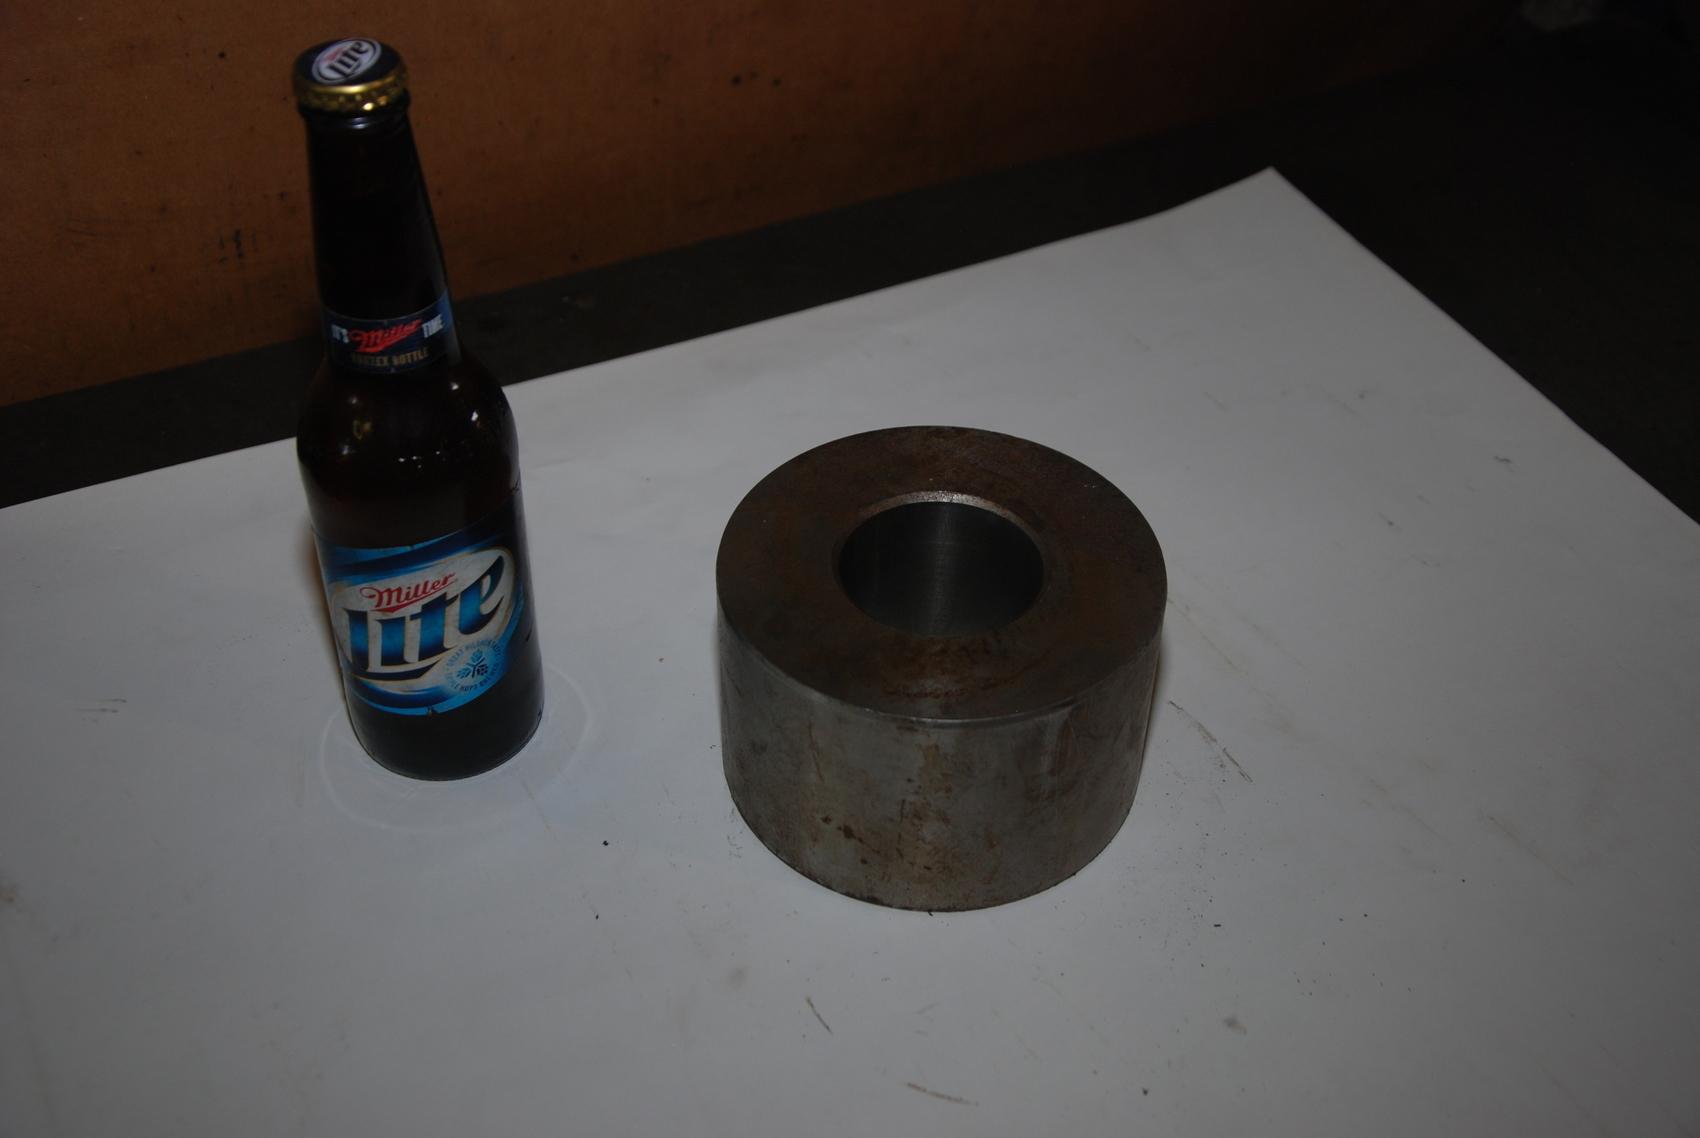 ONE Steel Round Bar Blacksmith 15lbs;5 1/4x3 1/4 In Hole 2 3/8x3 1/4